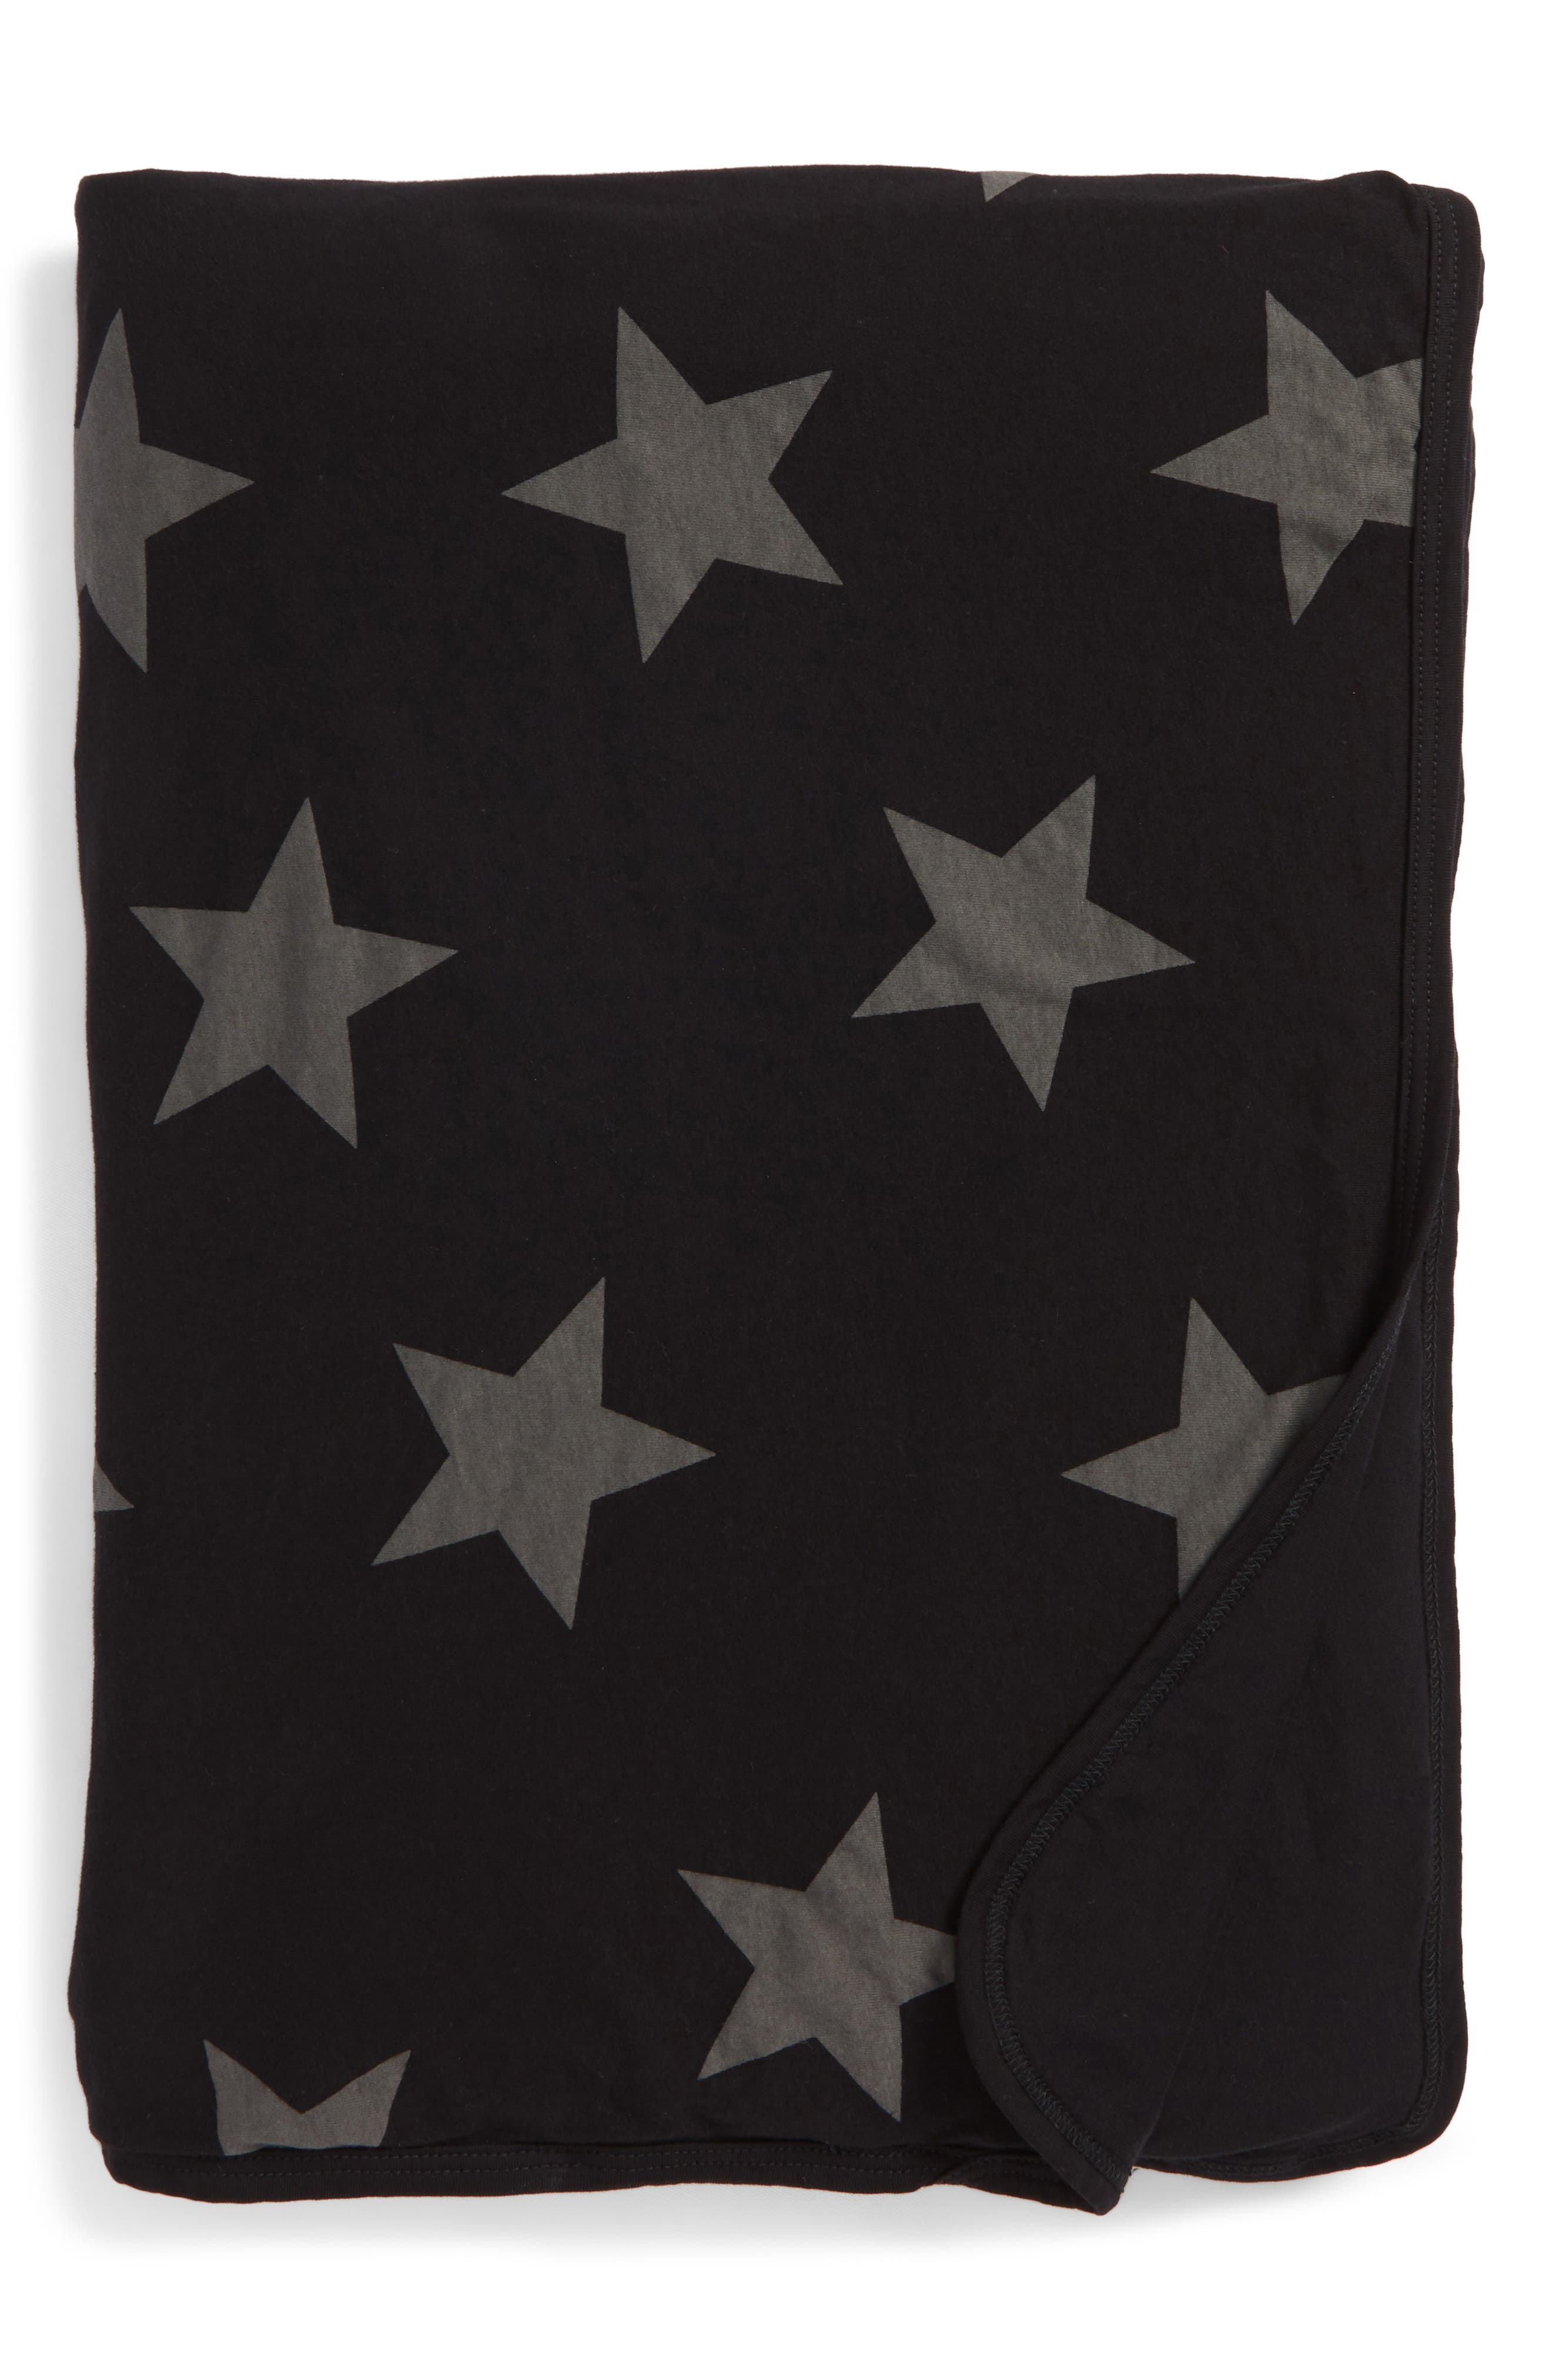 Star Print Blanket,                             Main thumbnail 1, color,                             001